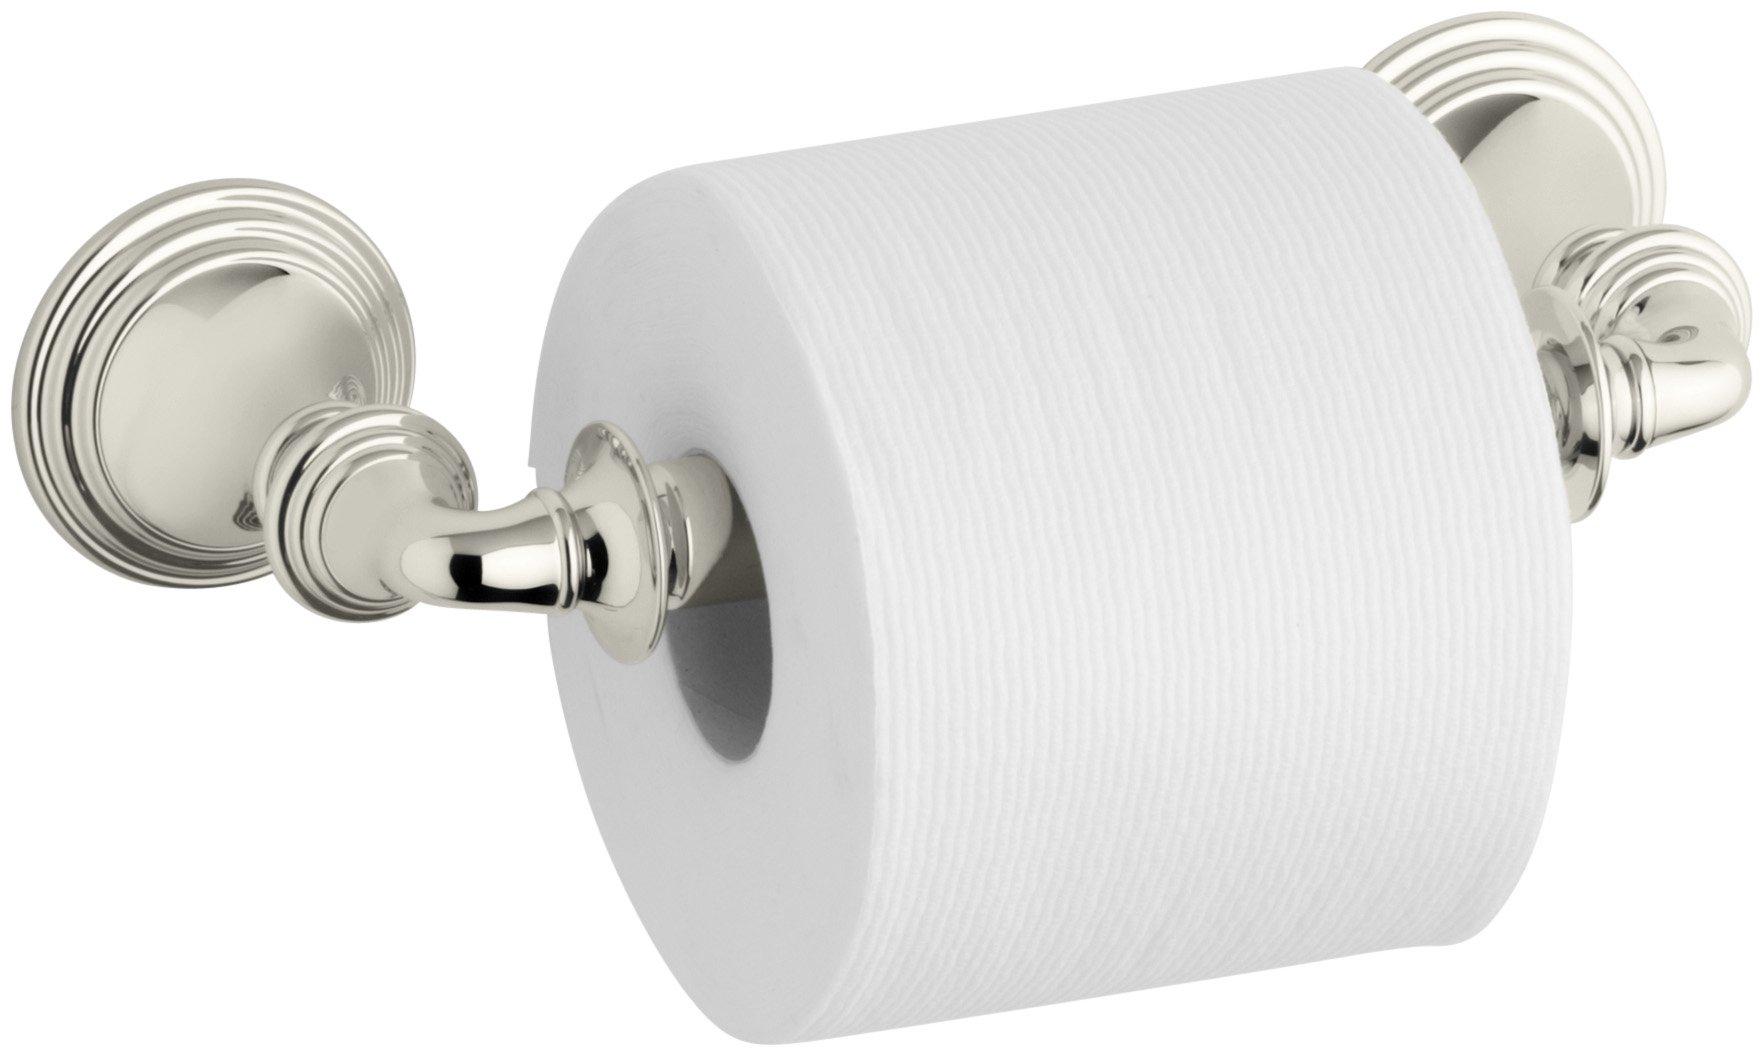 KOHLER K-10554-SN Devonshire Toilet Tissue Holder, Vibrant Polished Nickel